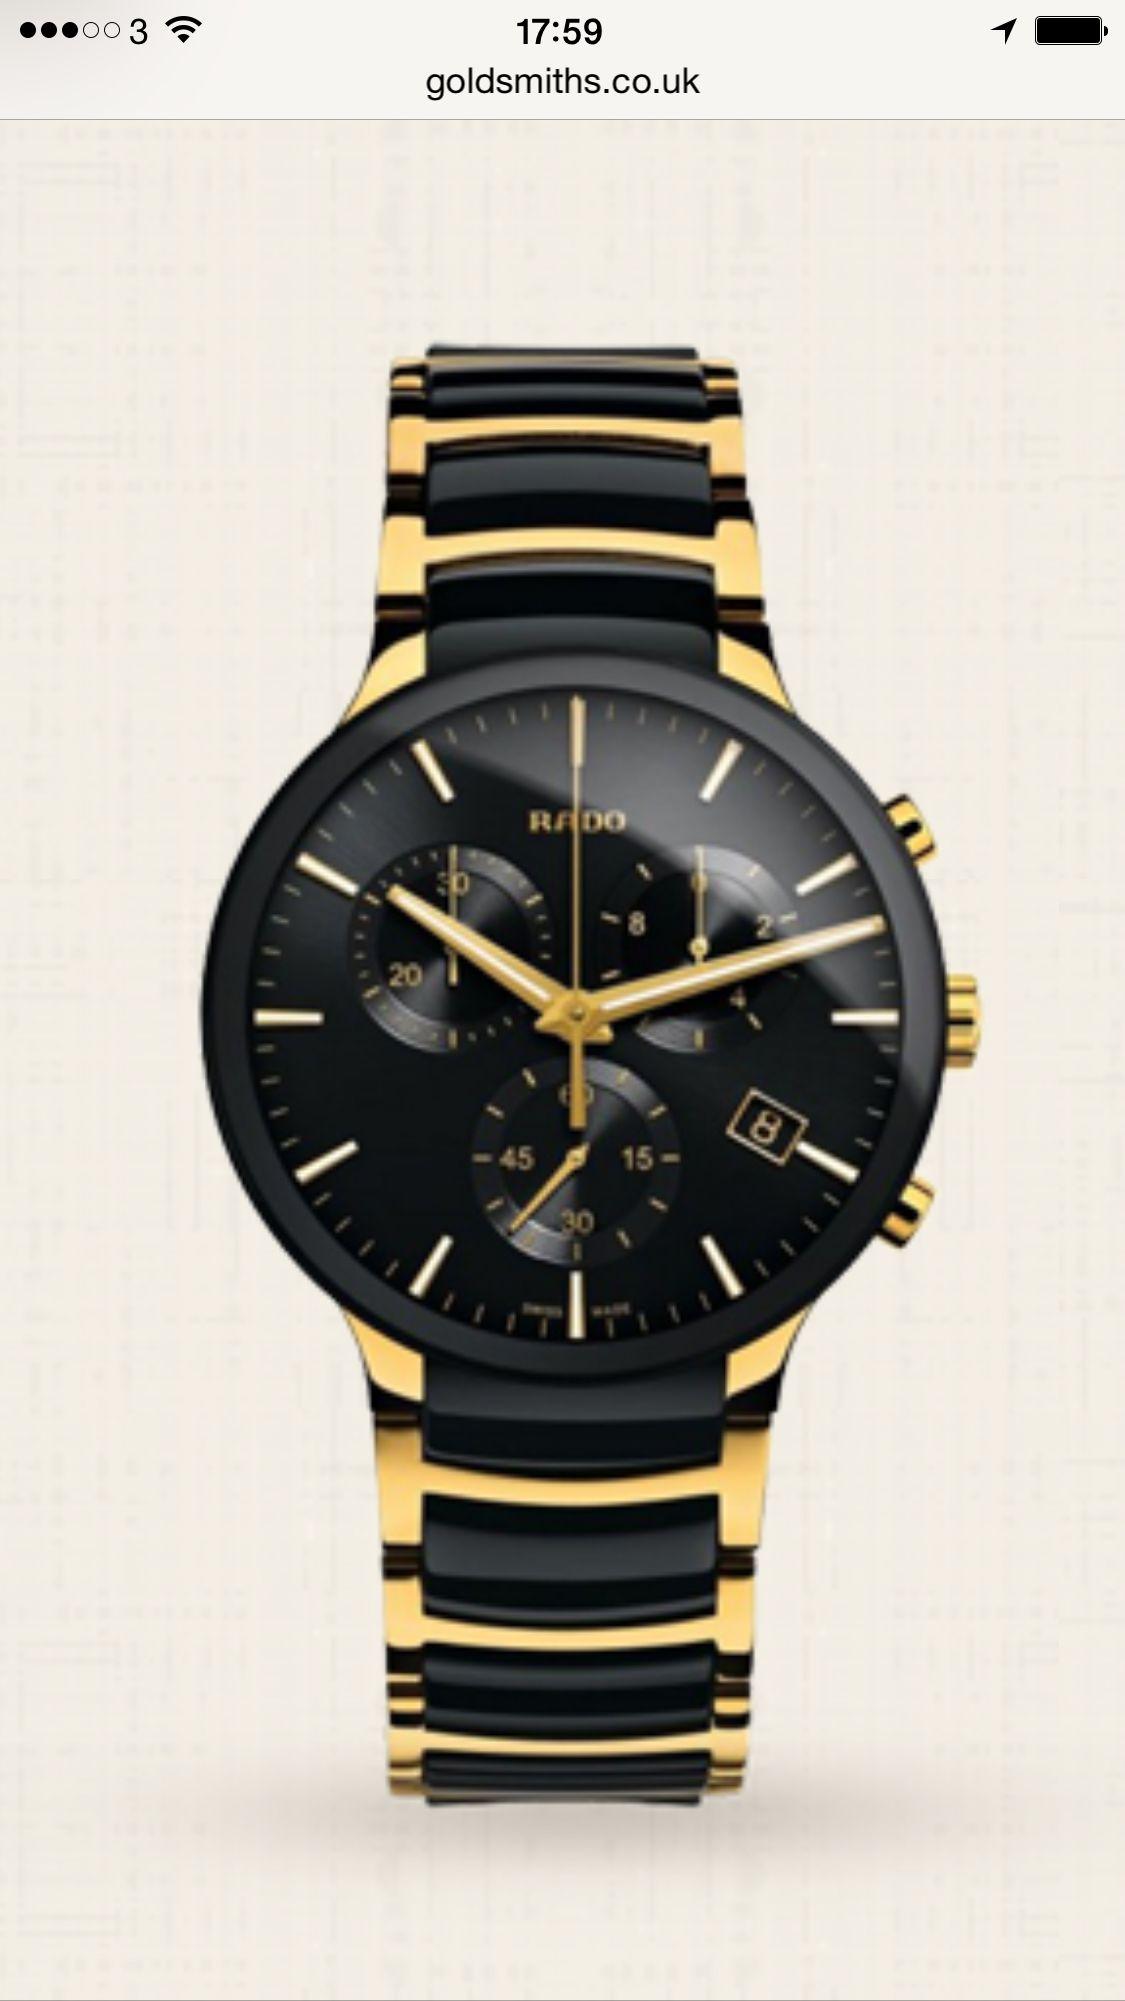 5f22ba3b3 Rado Luxury Watches, Rolex Watches, Watches For Men, Chronograph, Stainless  Steel Watch